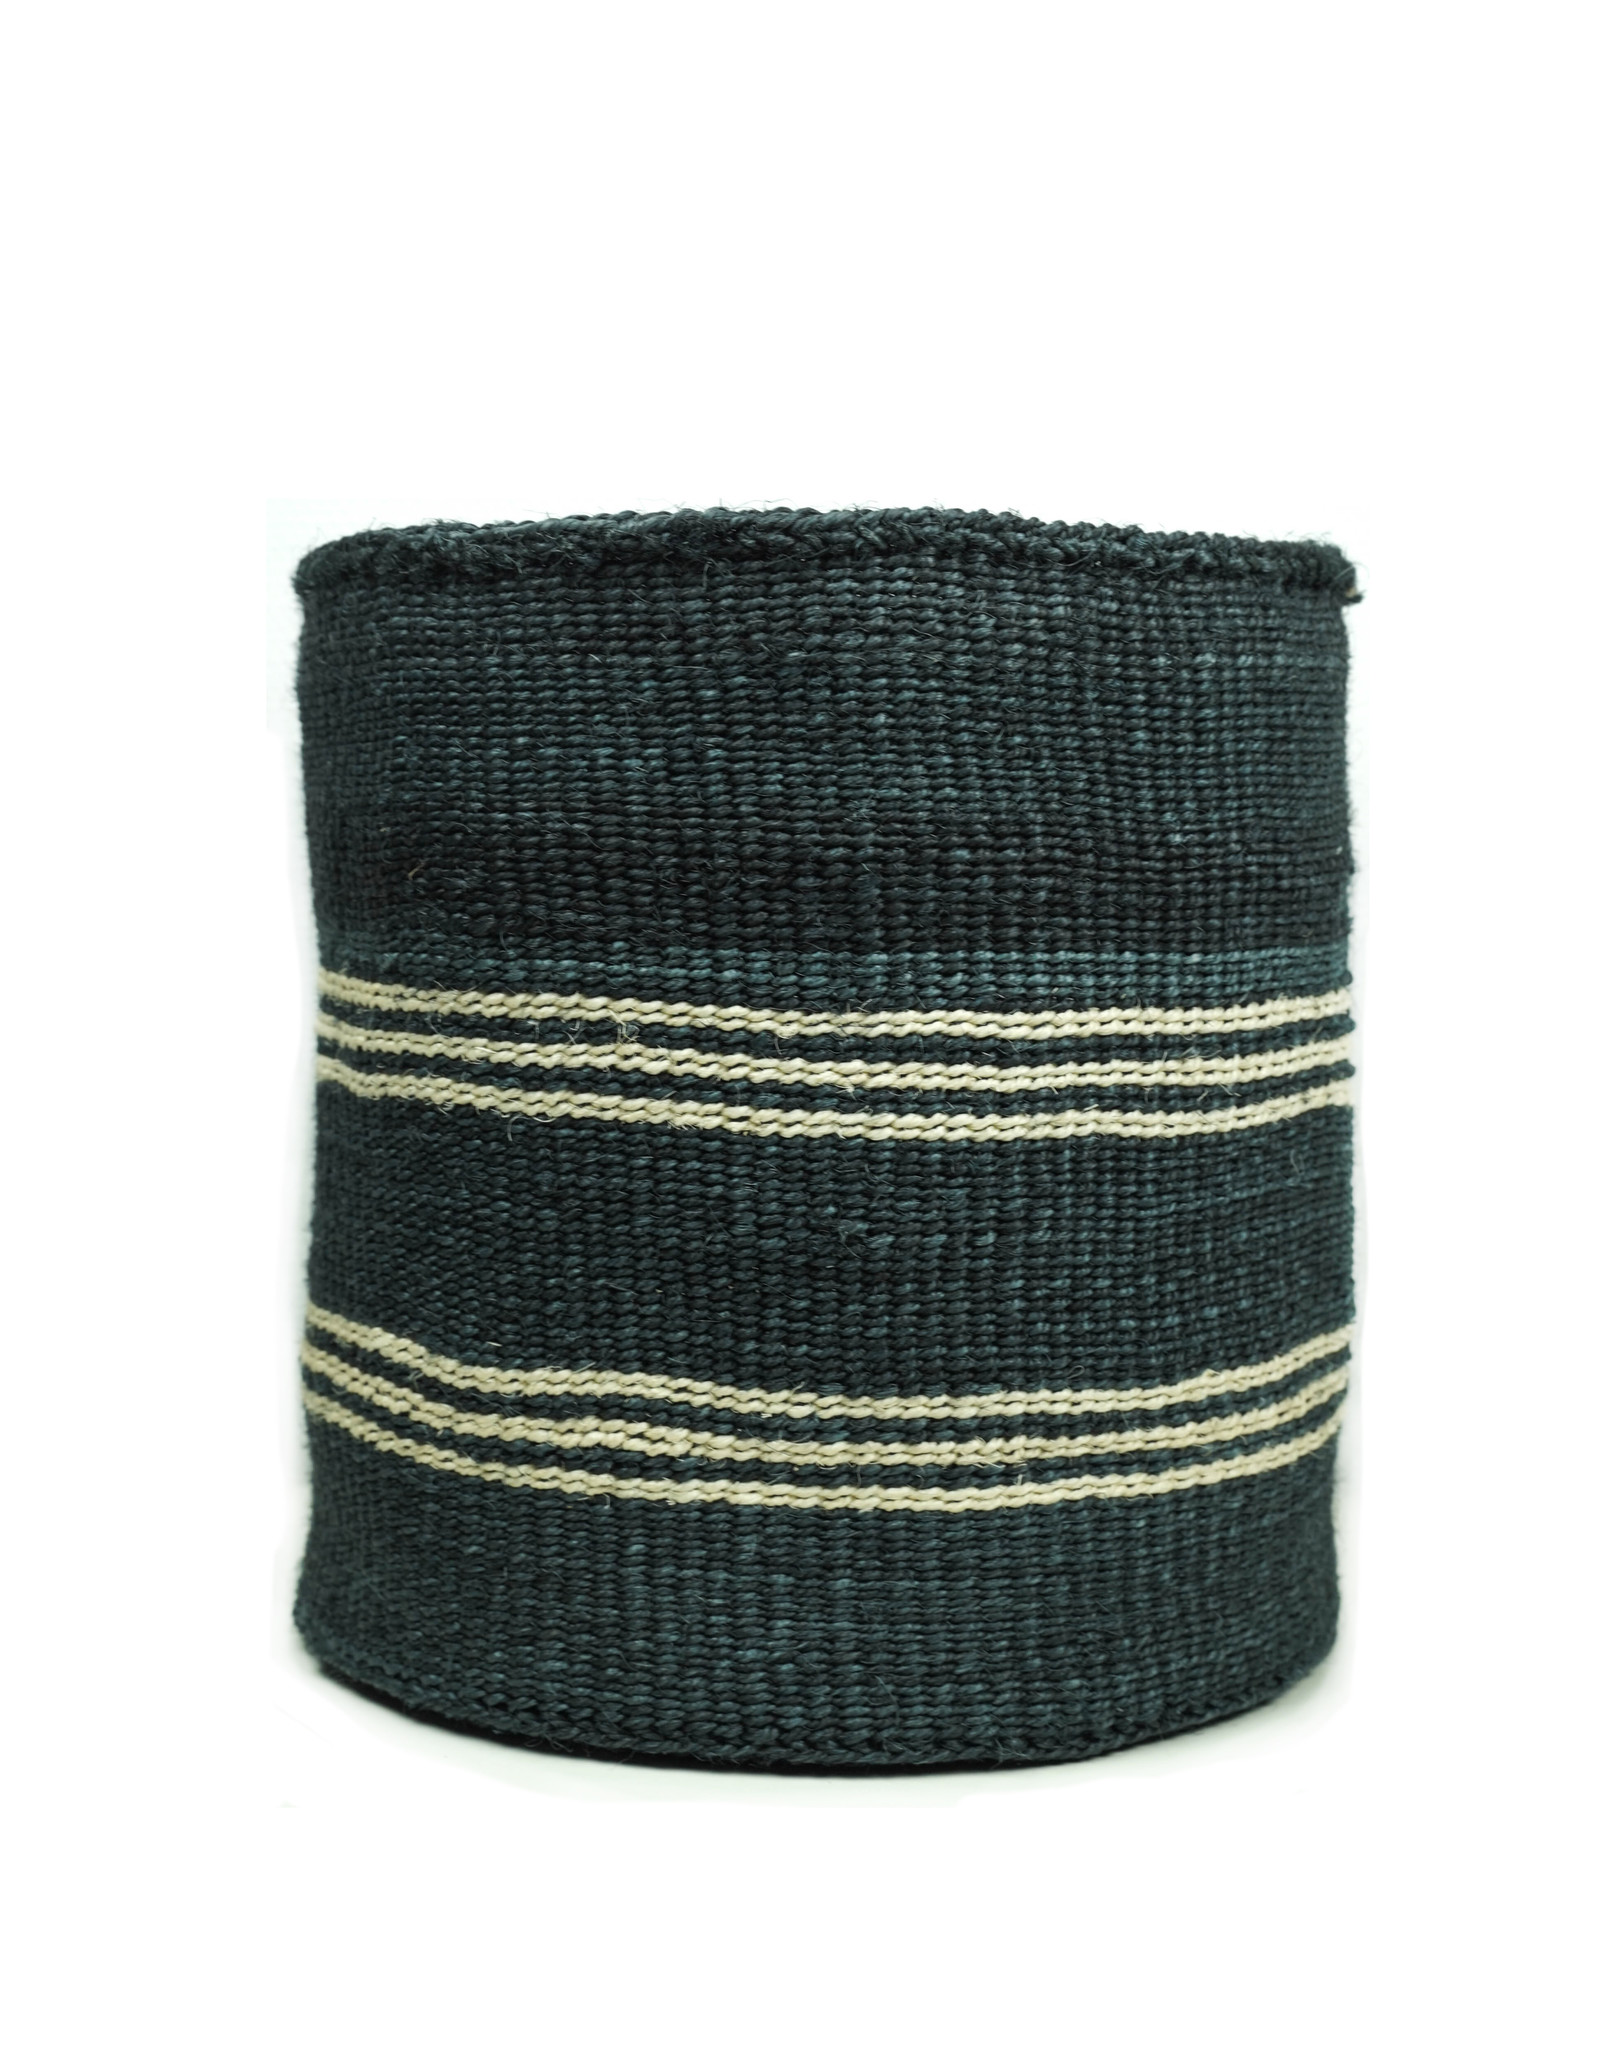 Maisha.Style Taita basket - marine & ivory - XL3